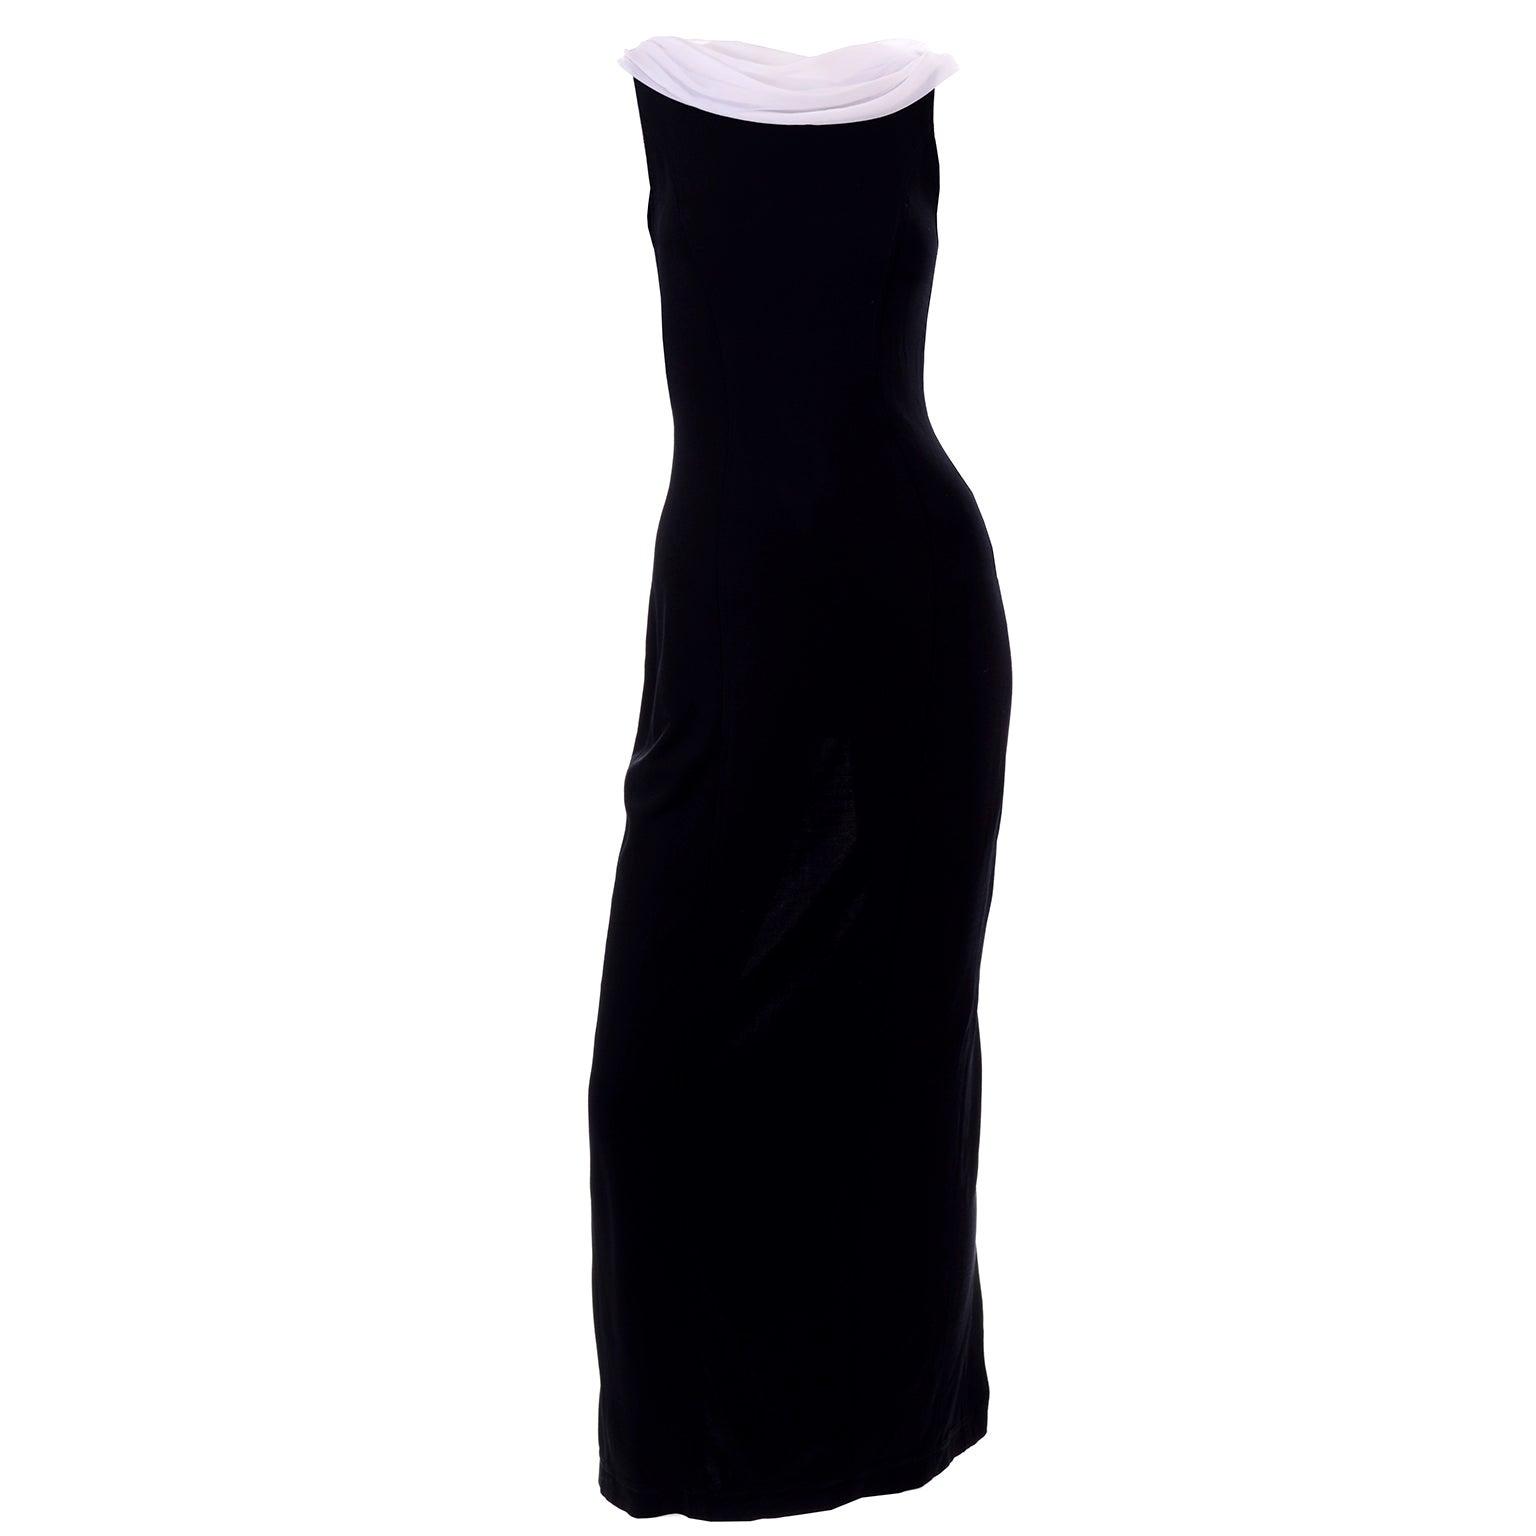 Vintage Tadashi Black Evening Gown Dress W/ Open Low Back And White Drape Train